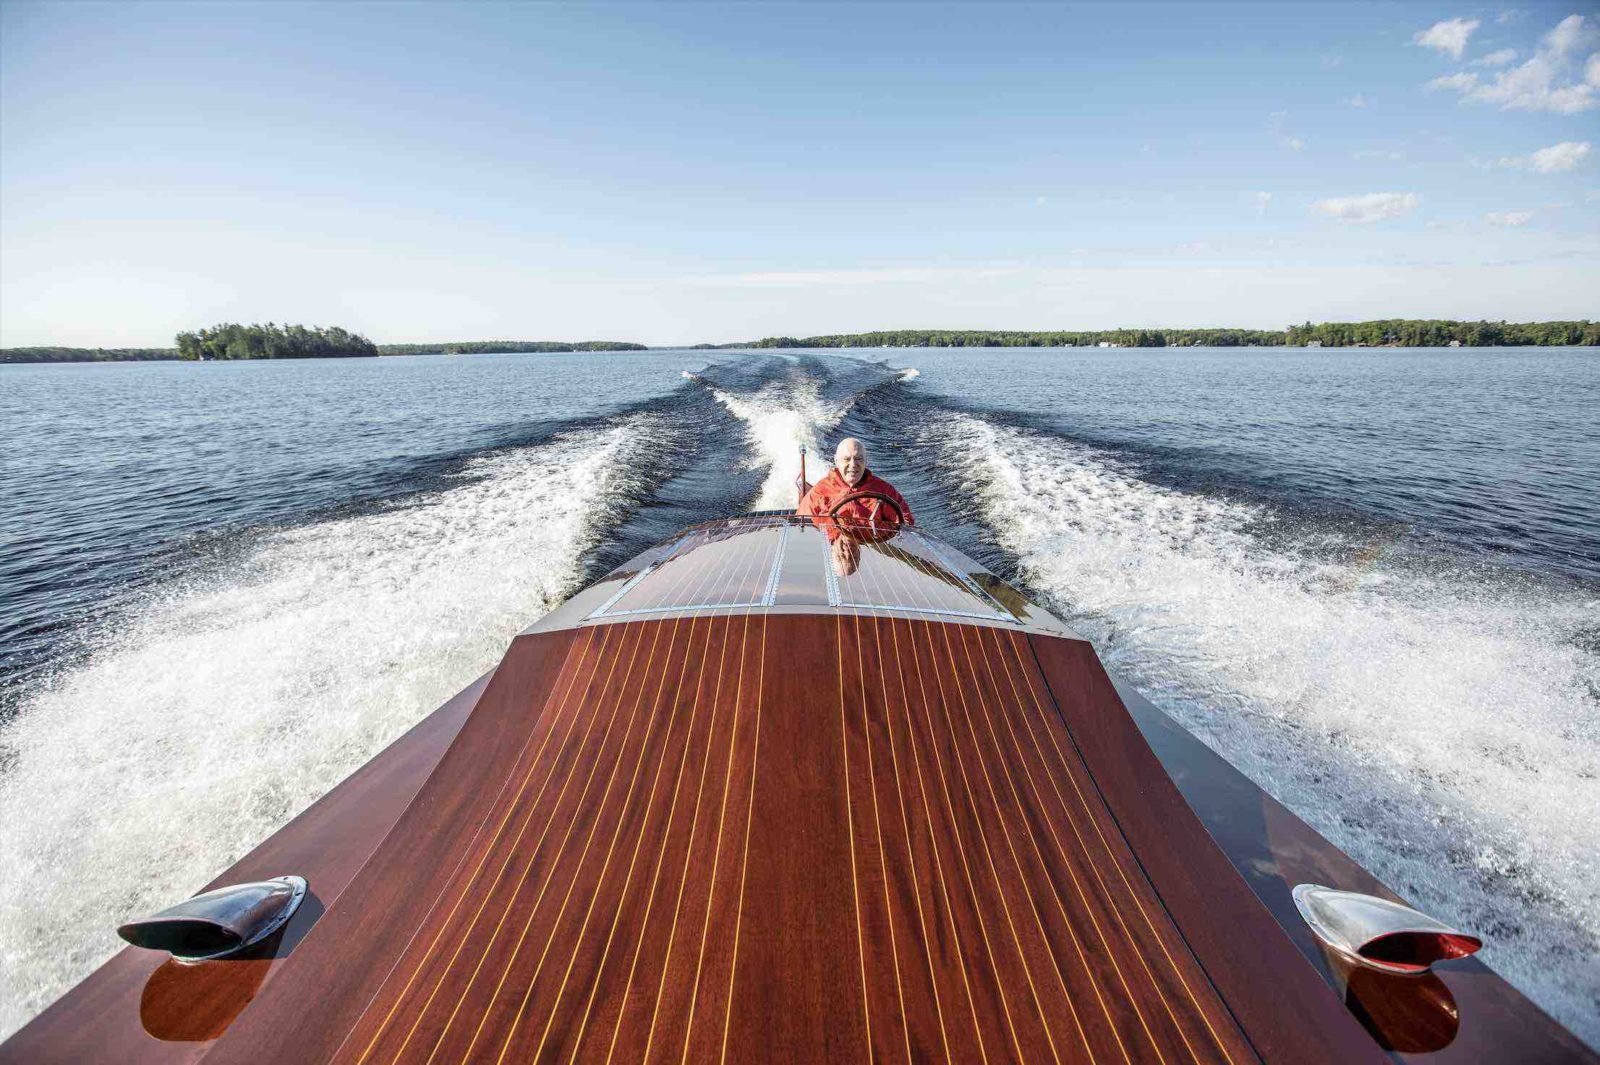 Murray Walker at the Wheel of Classic Boat Miss Supertest III racing across Muskoka Lakes